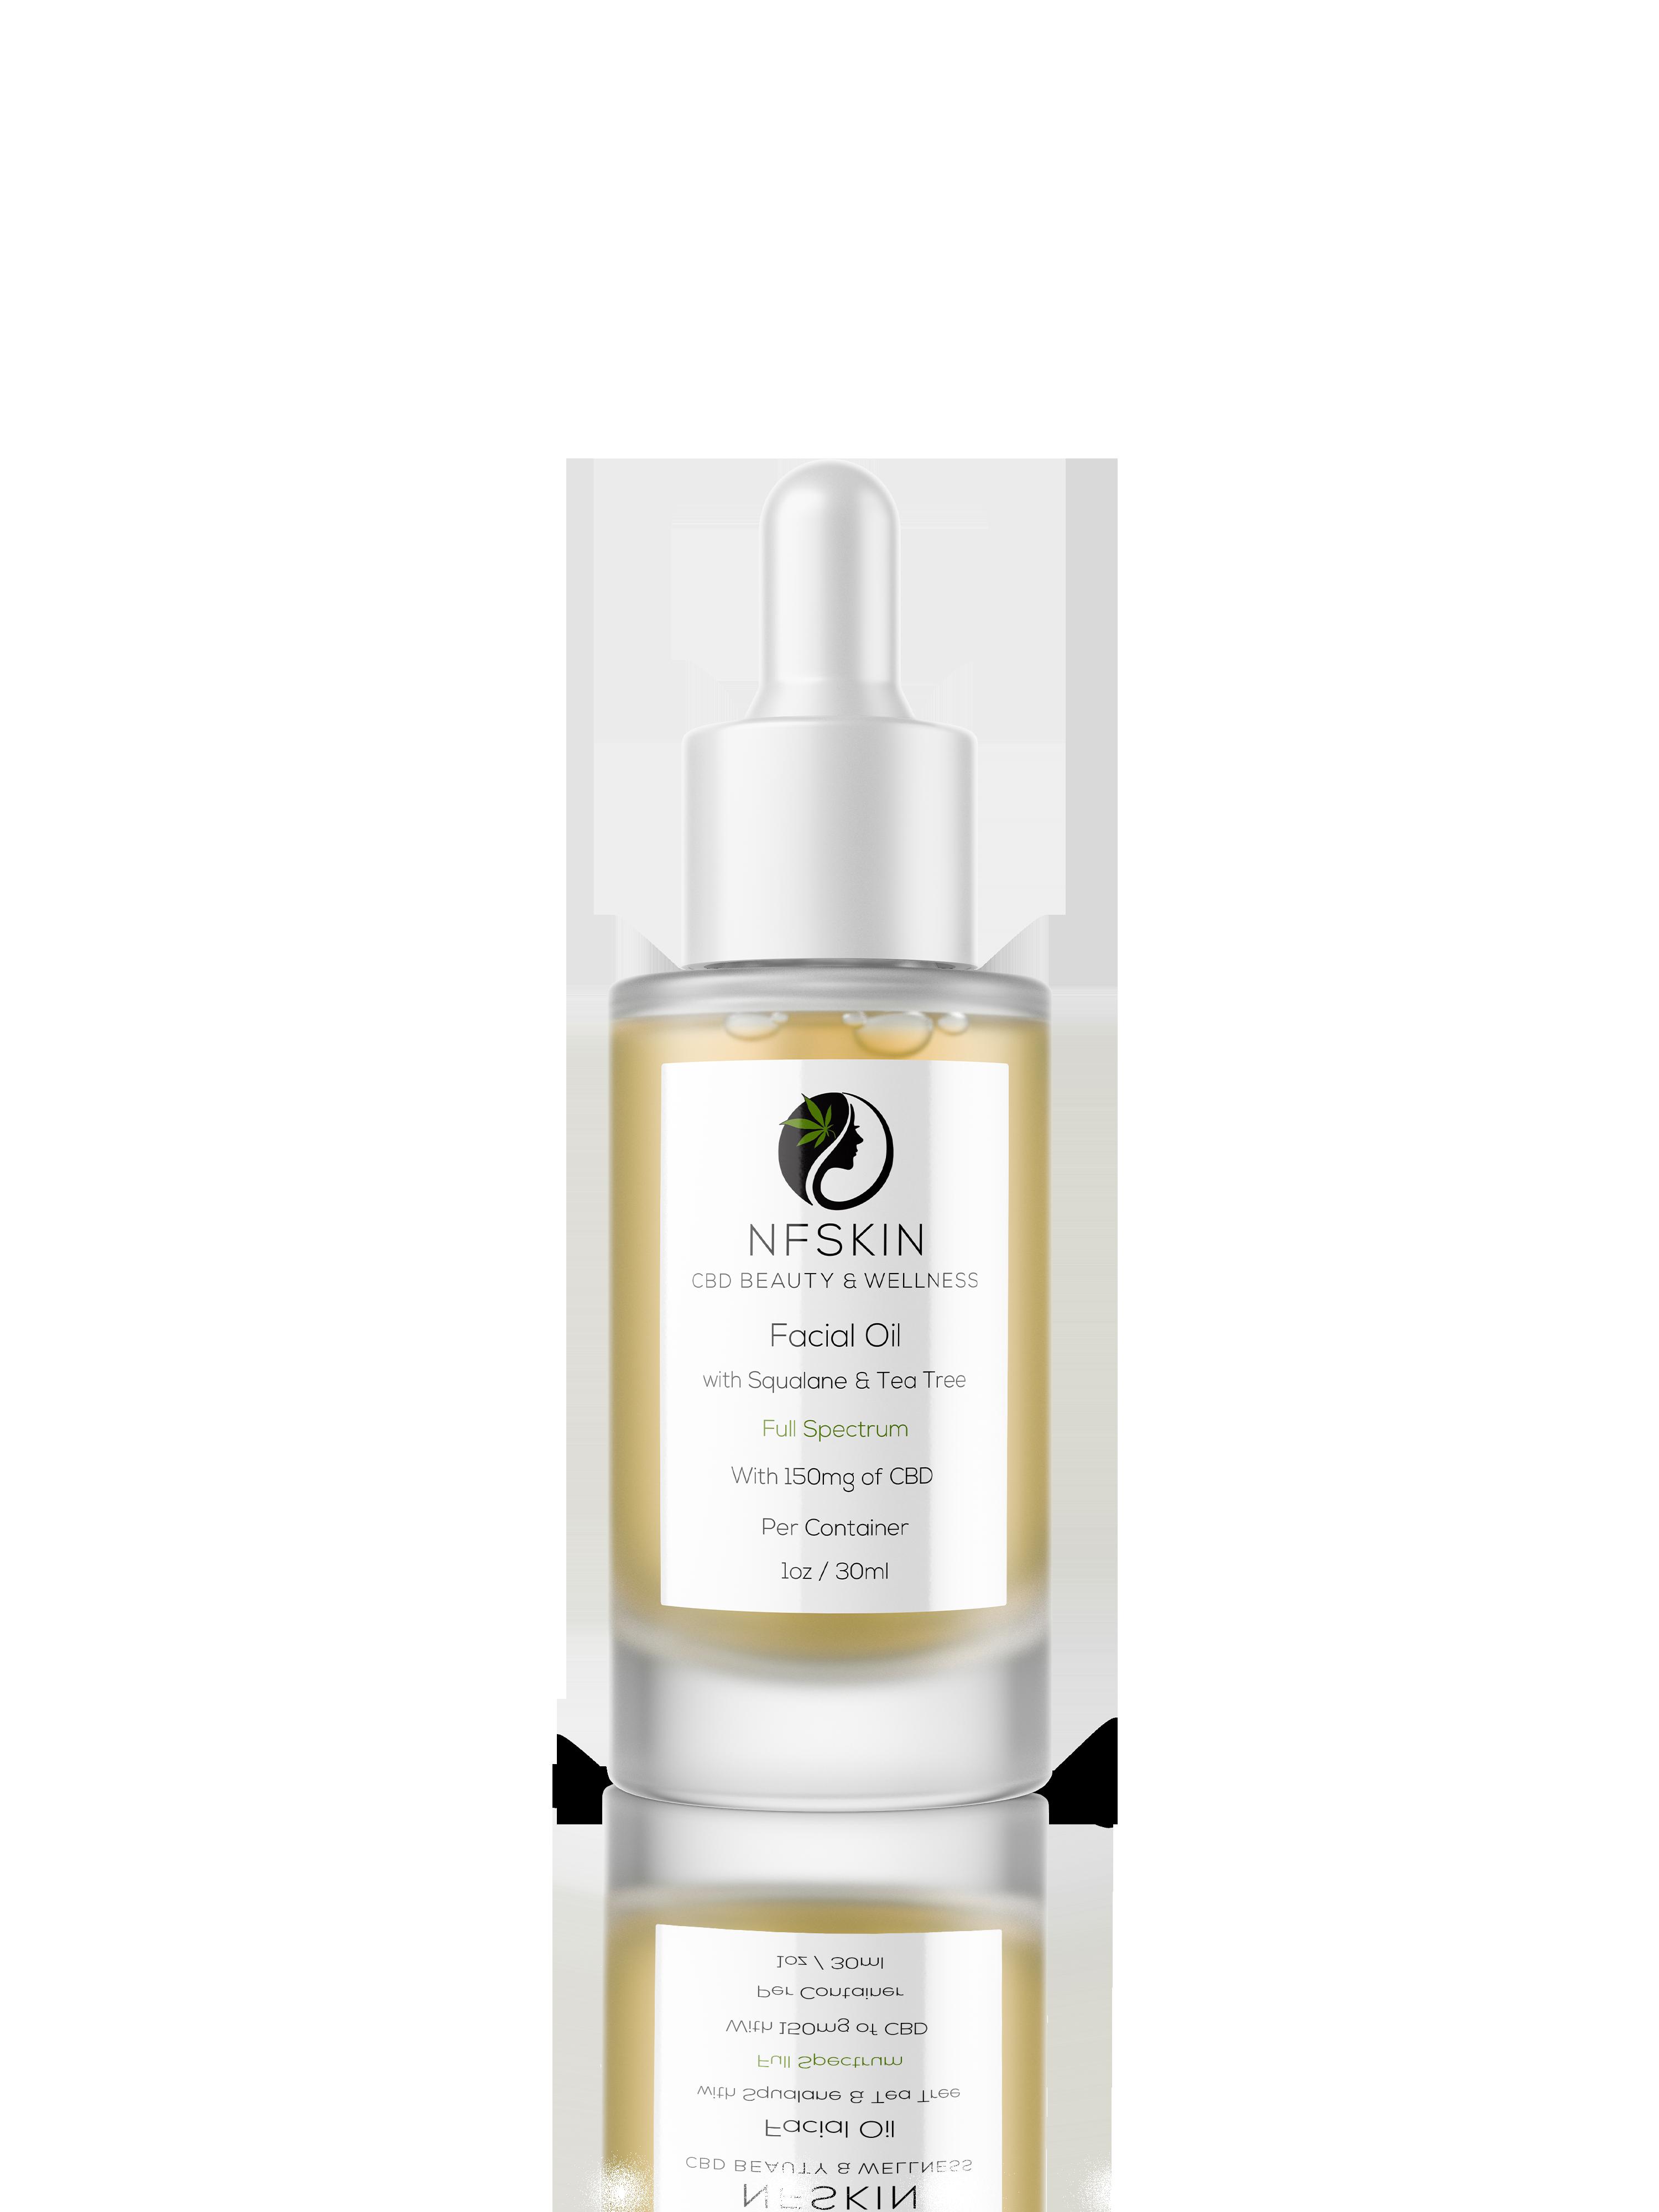 Facial Oil + Squalane and Tea Tree Oil